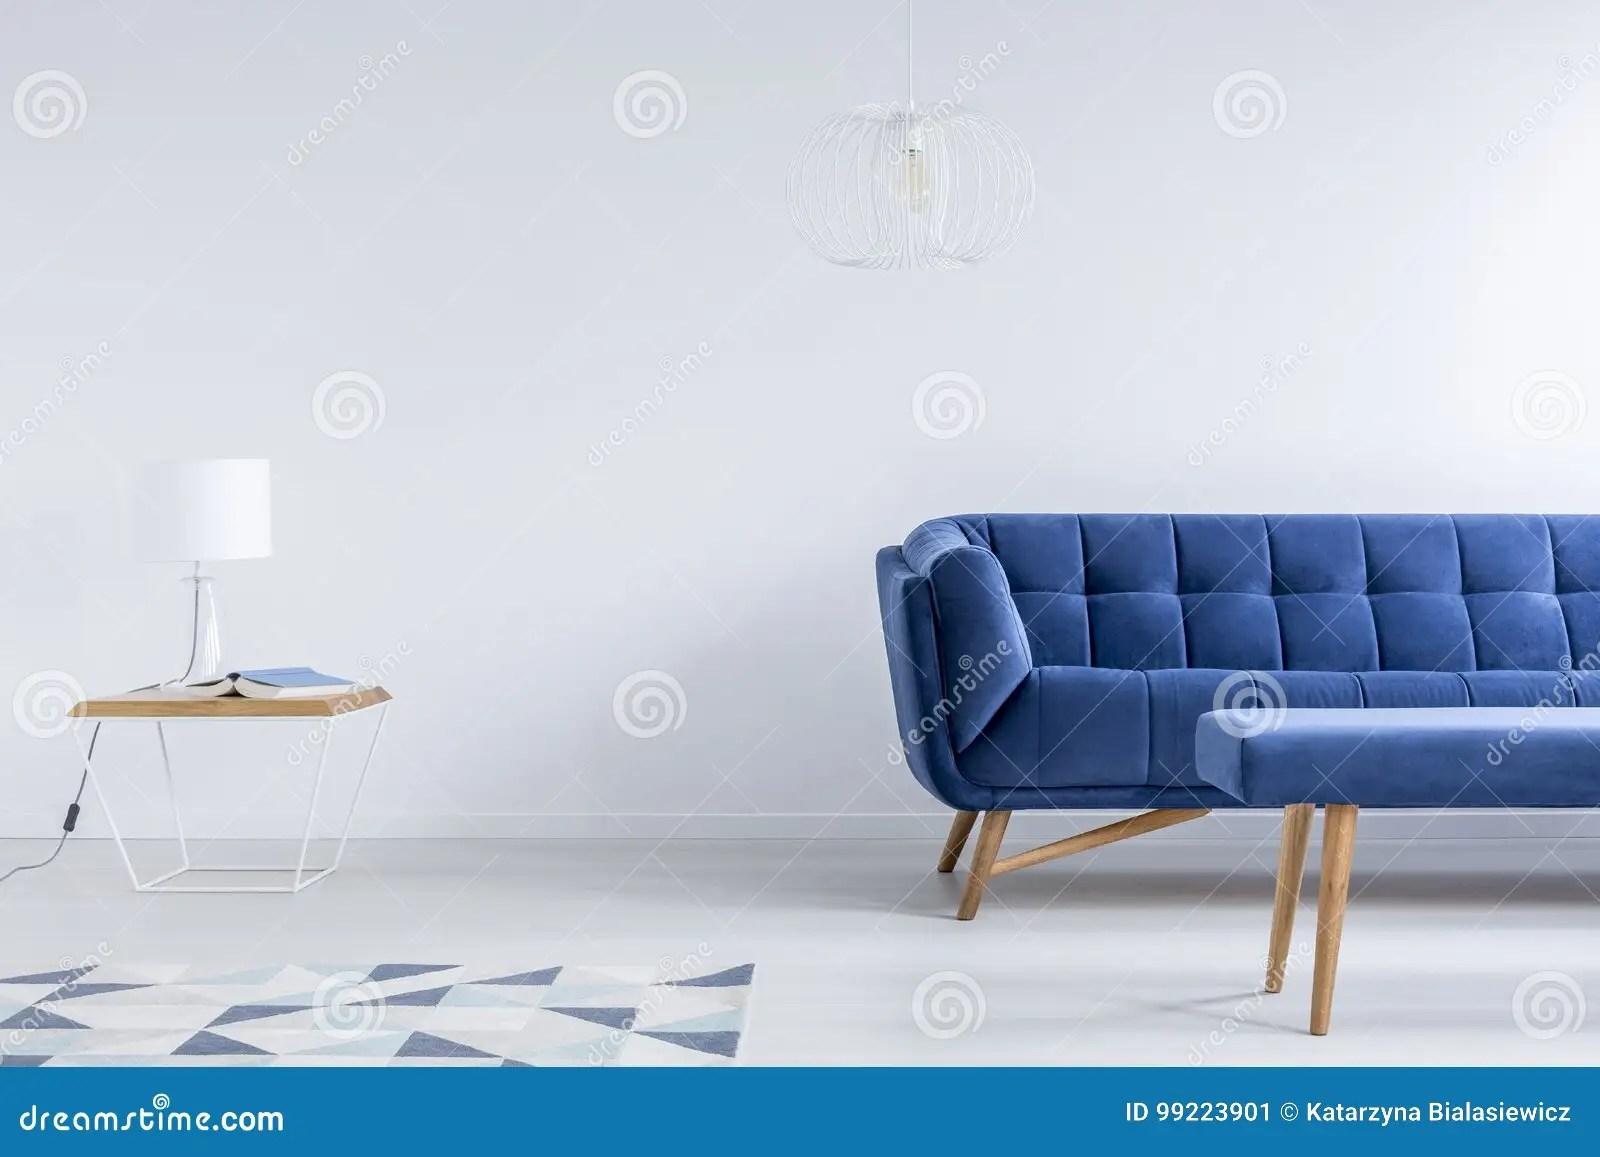 teal kitchen rugs inventory 有藏青色长沙发的室库存图片 图片包括有长沙发 面板 内部 browne 蓝 在桌的白色灯在几何地毯附近在有藏青色长沙发和凳子的客厅